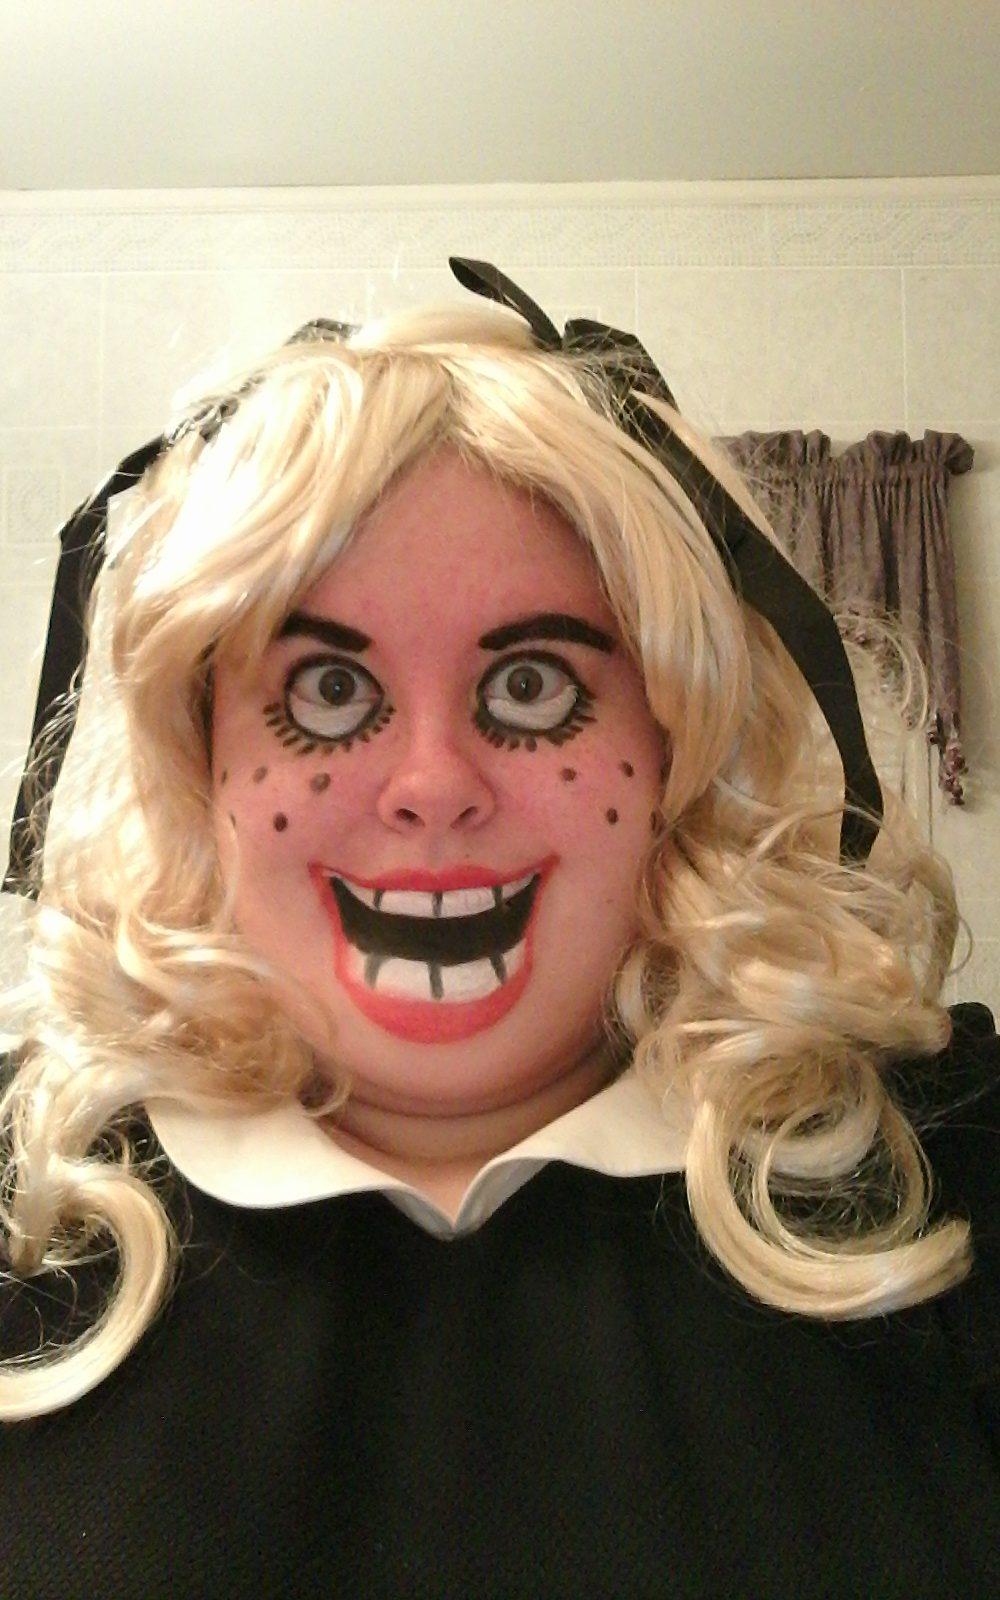 DIY Creepy Baby Doll Costume and Makeup Creepy baby